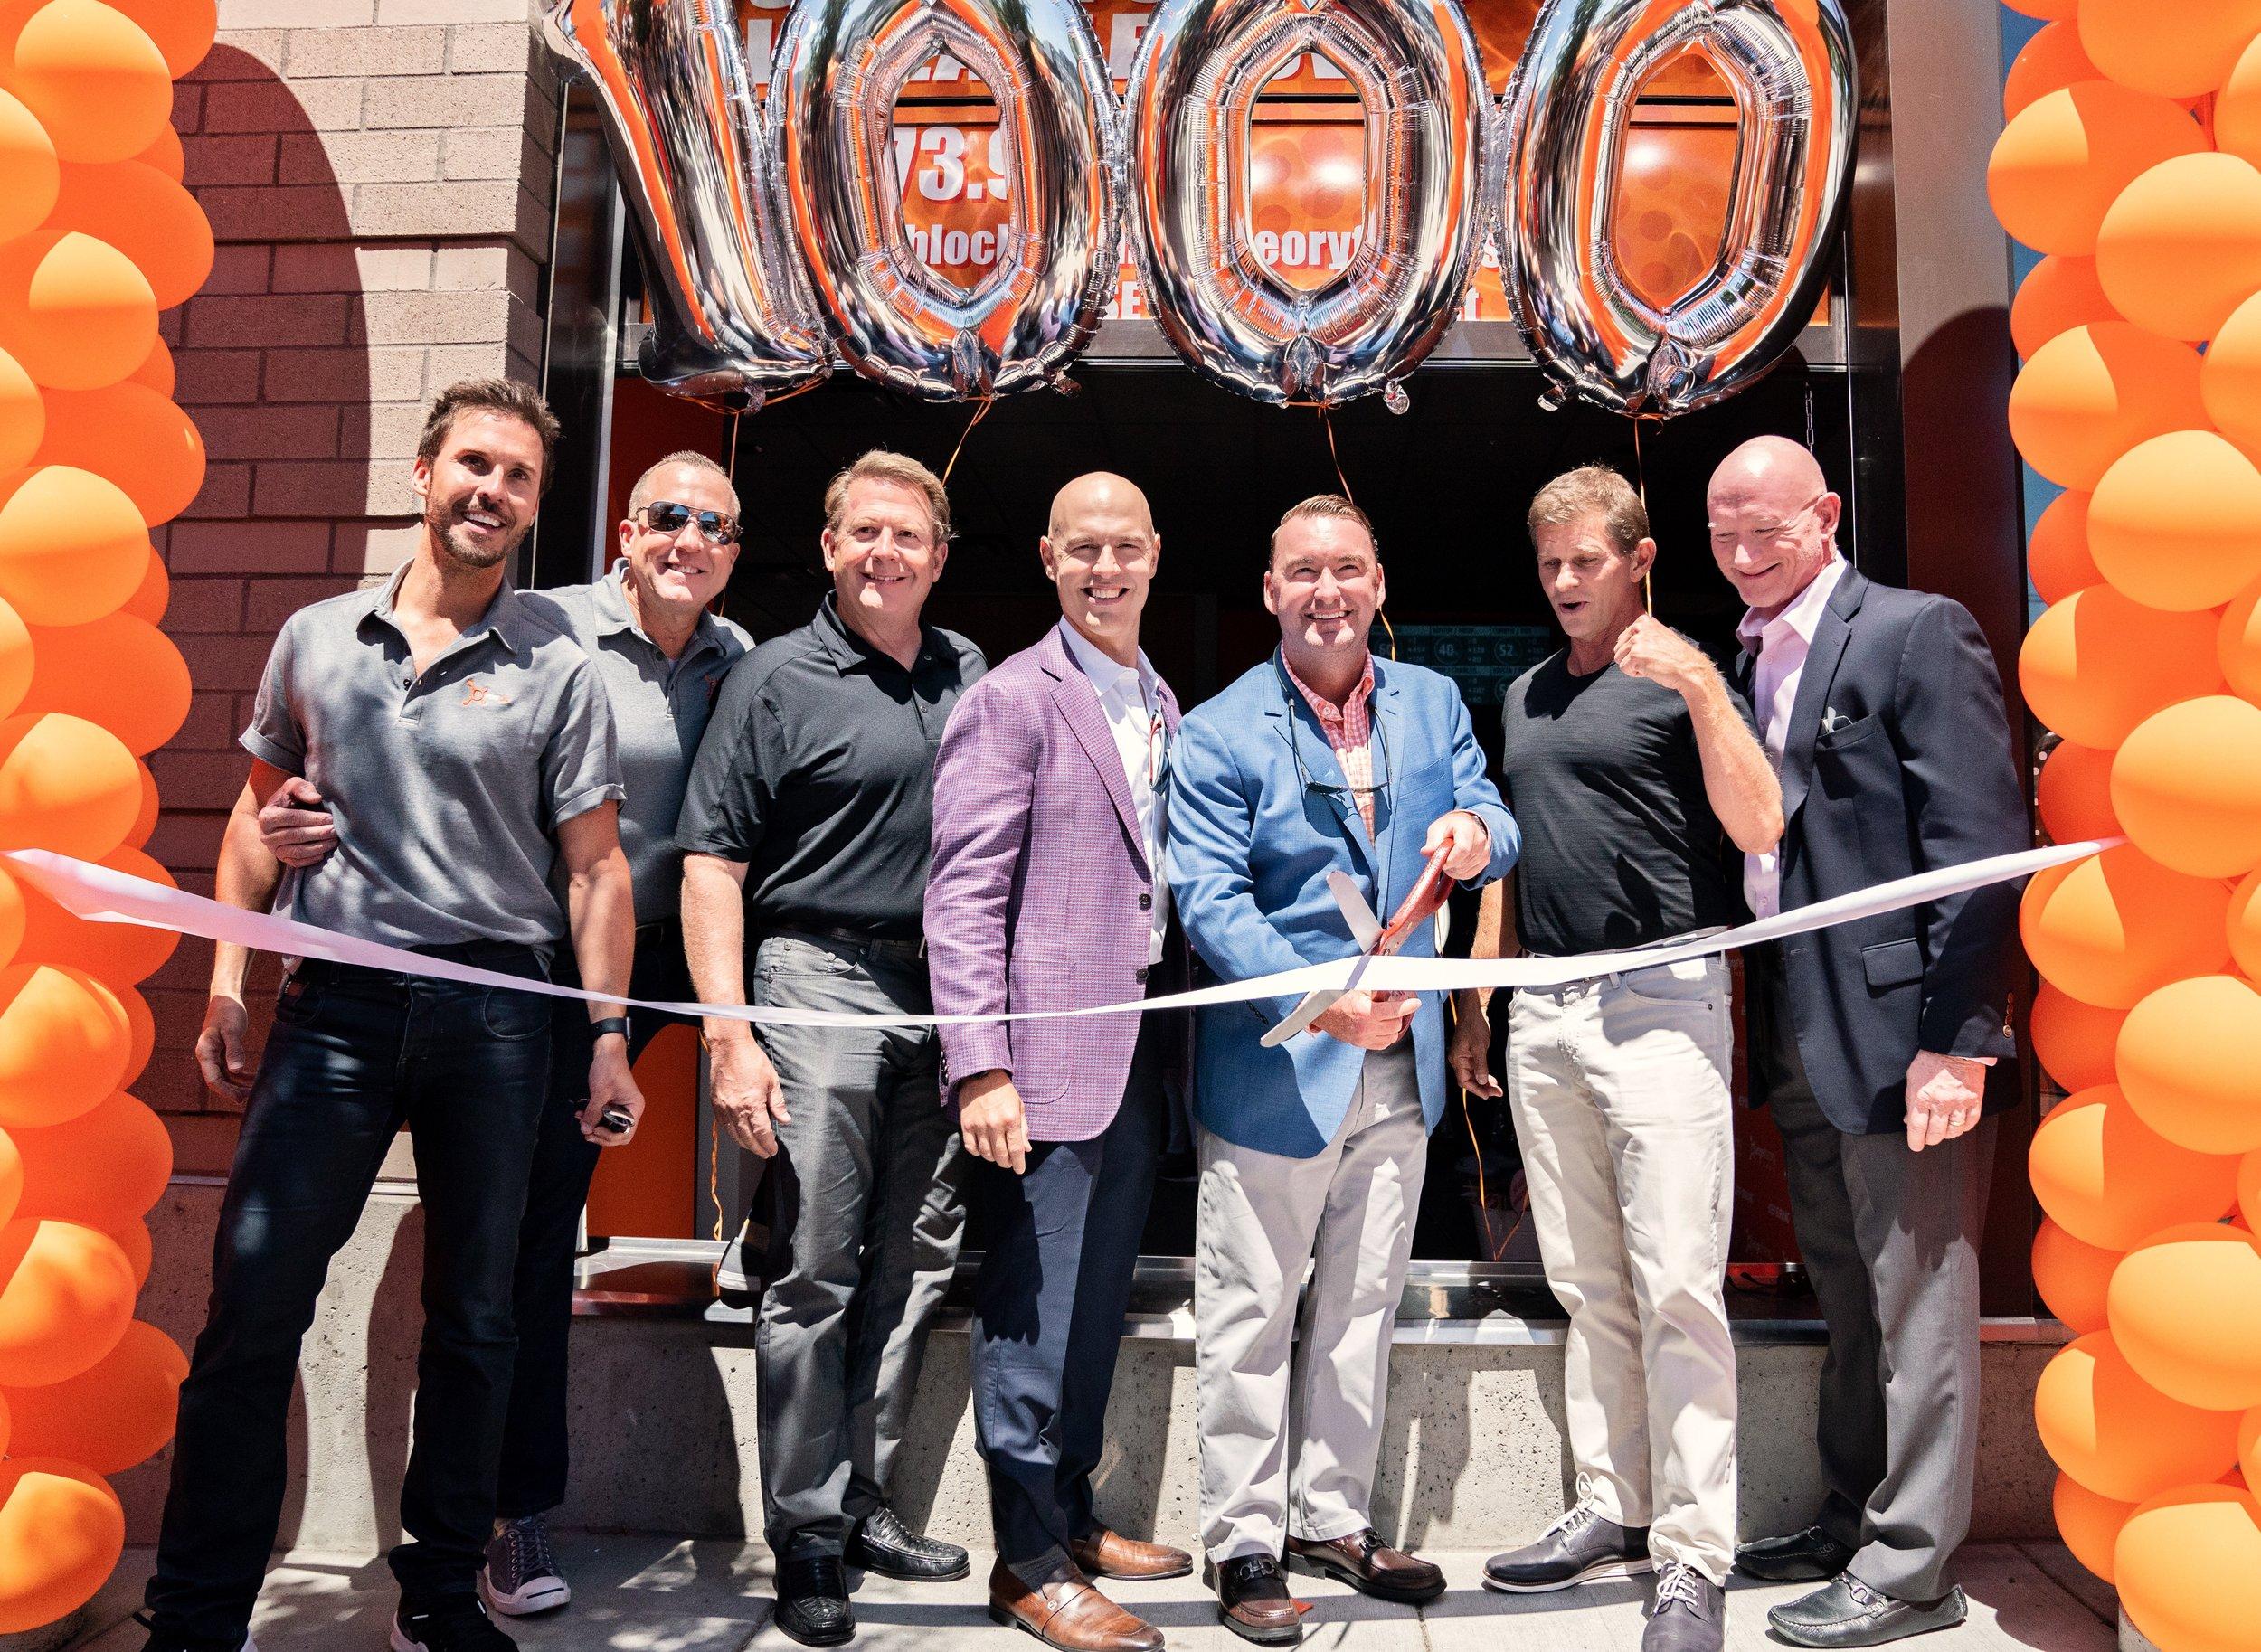 Ribbon cutting at Orangetheory Goat Blocks, the 1000th studio with the Orangetheory executive team!